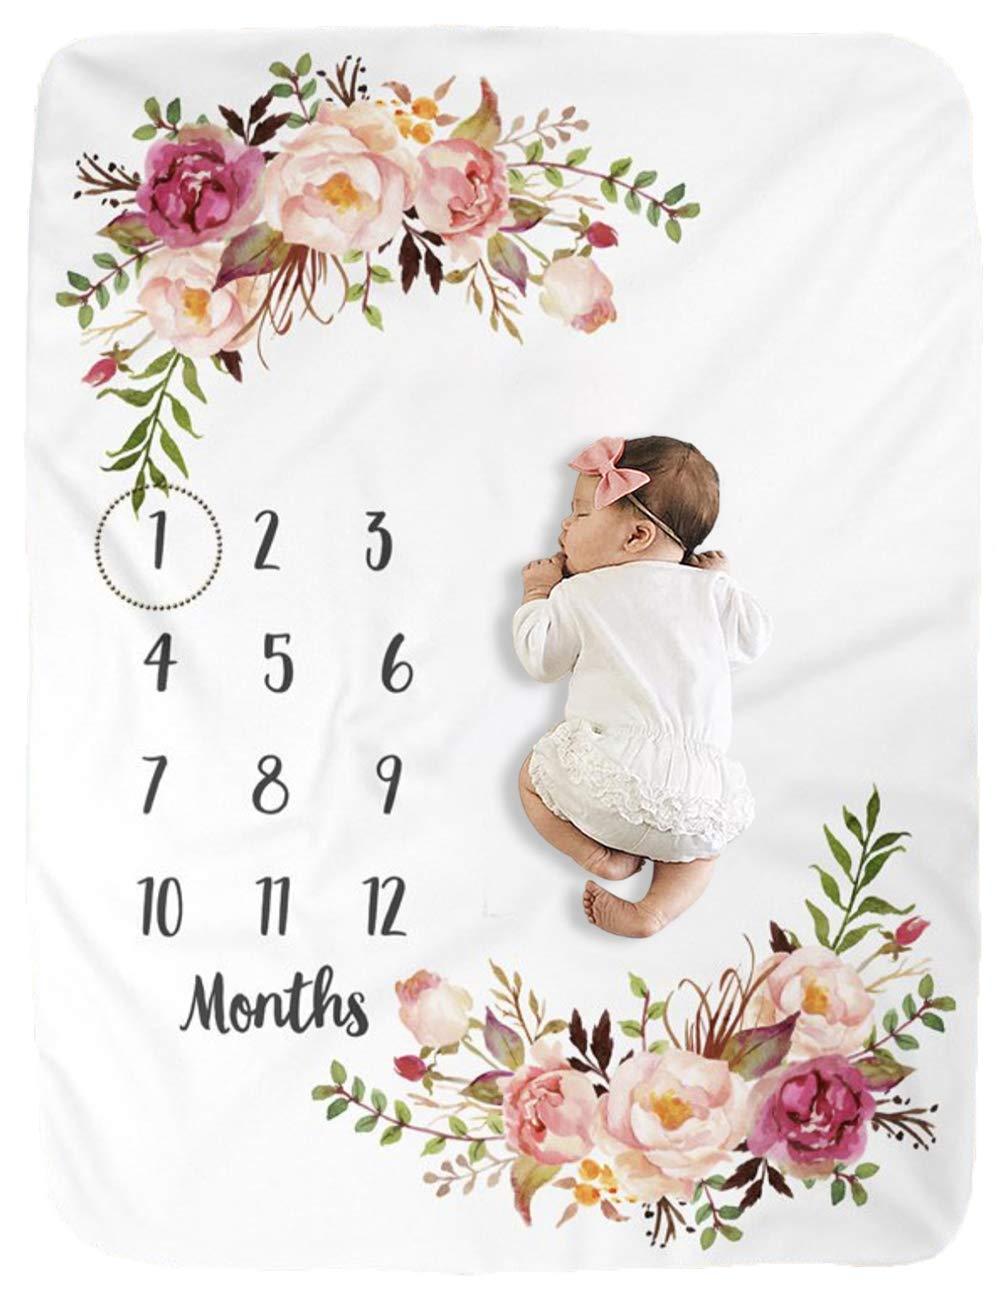 Milestone Blanket/Baby Milestone Blanket Girl Boy/Large Baby Blankets for Girls and Boys Newborn Photography Premium Fleece Baby Monthly Blanket Shower Gifts by BUTTZO